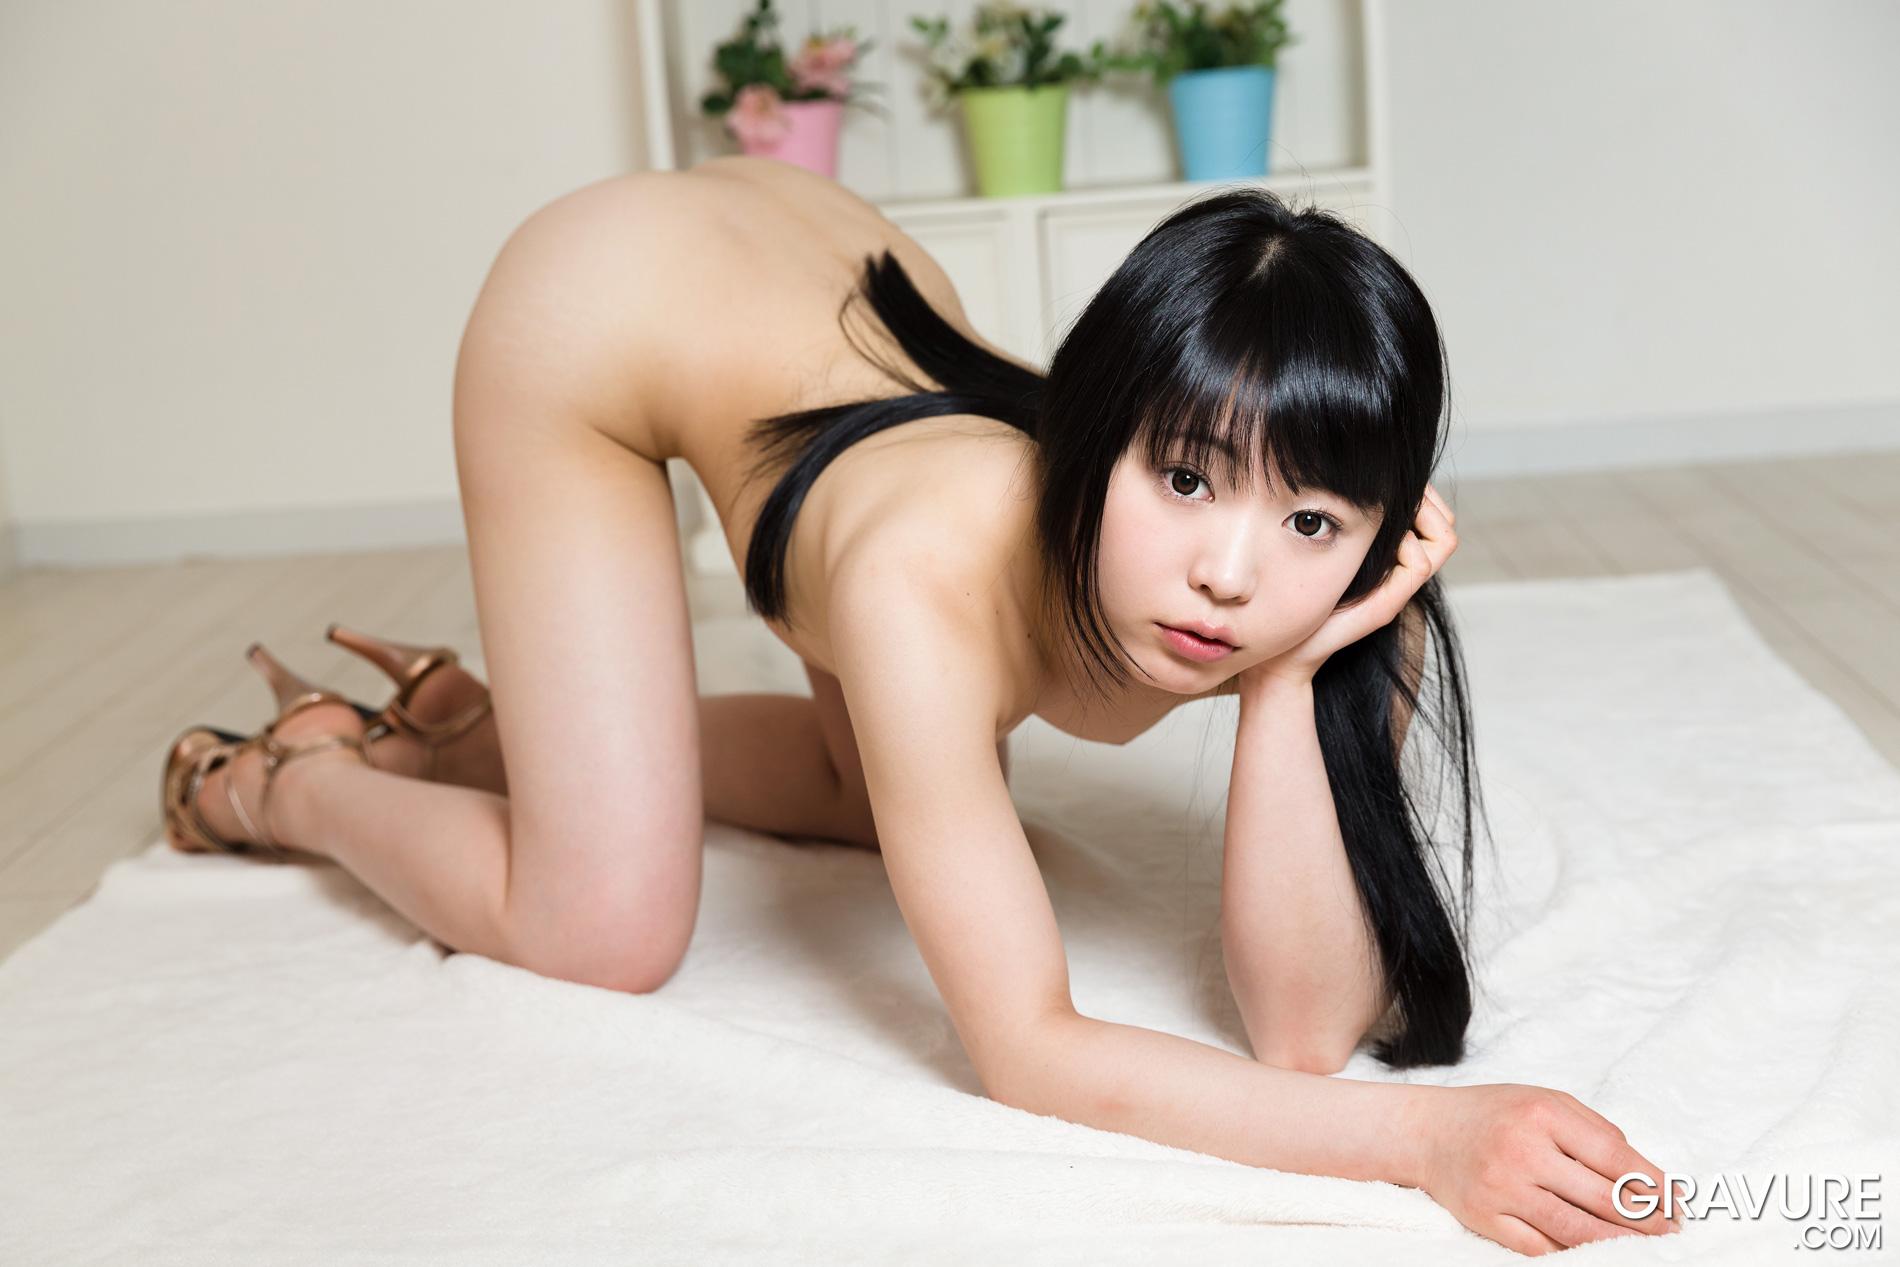 Japanese Gravure Idol Nude Pussy